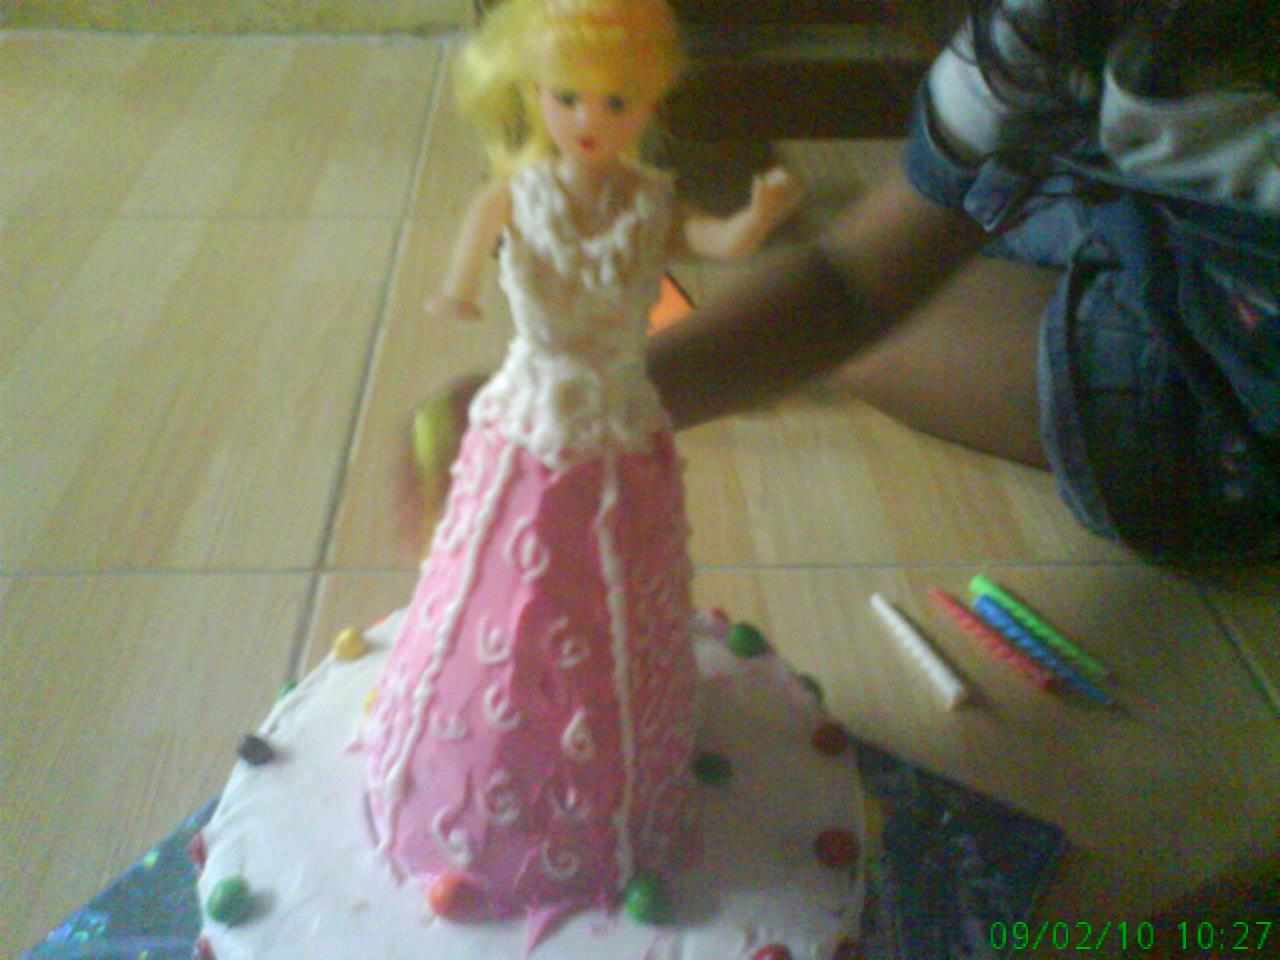 1280 x 960 · 195 kB · jpeg, Resep Kue Tart Barbie Fondant